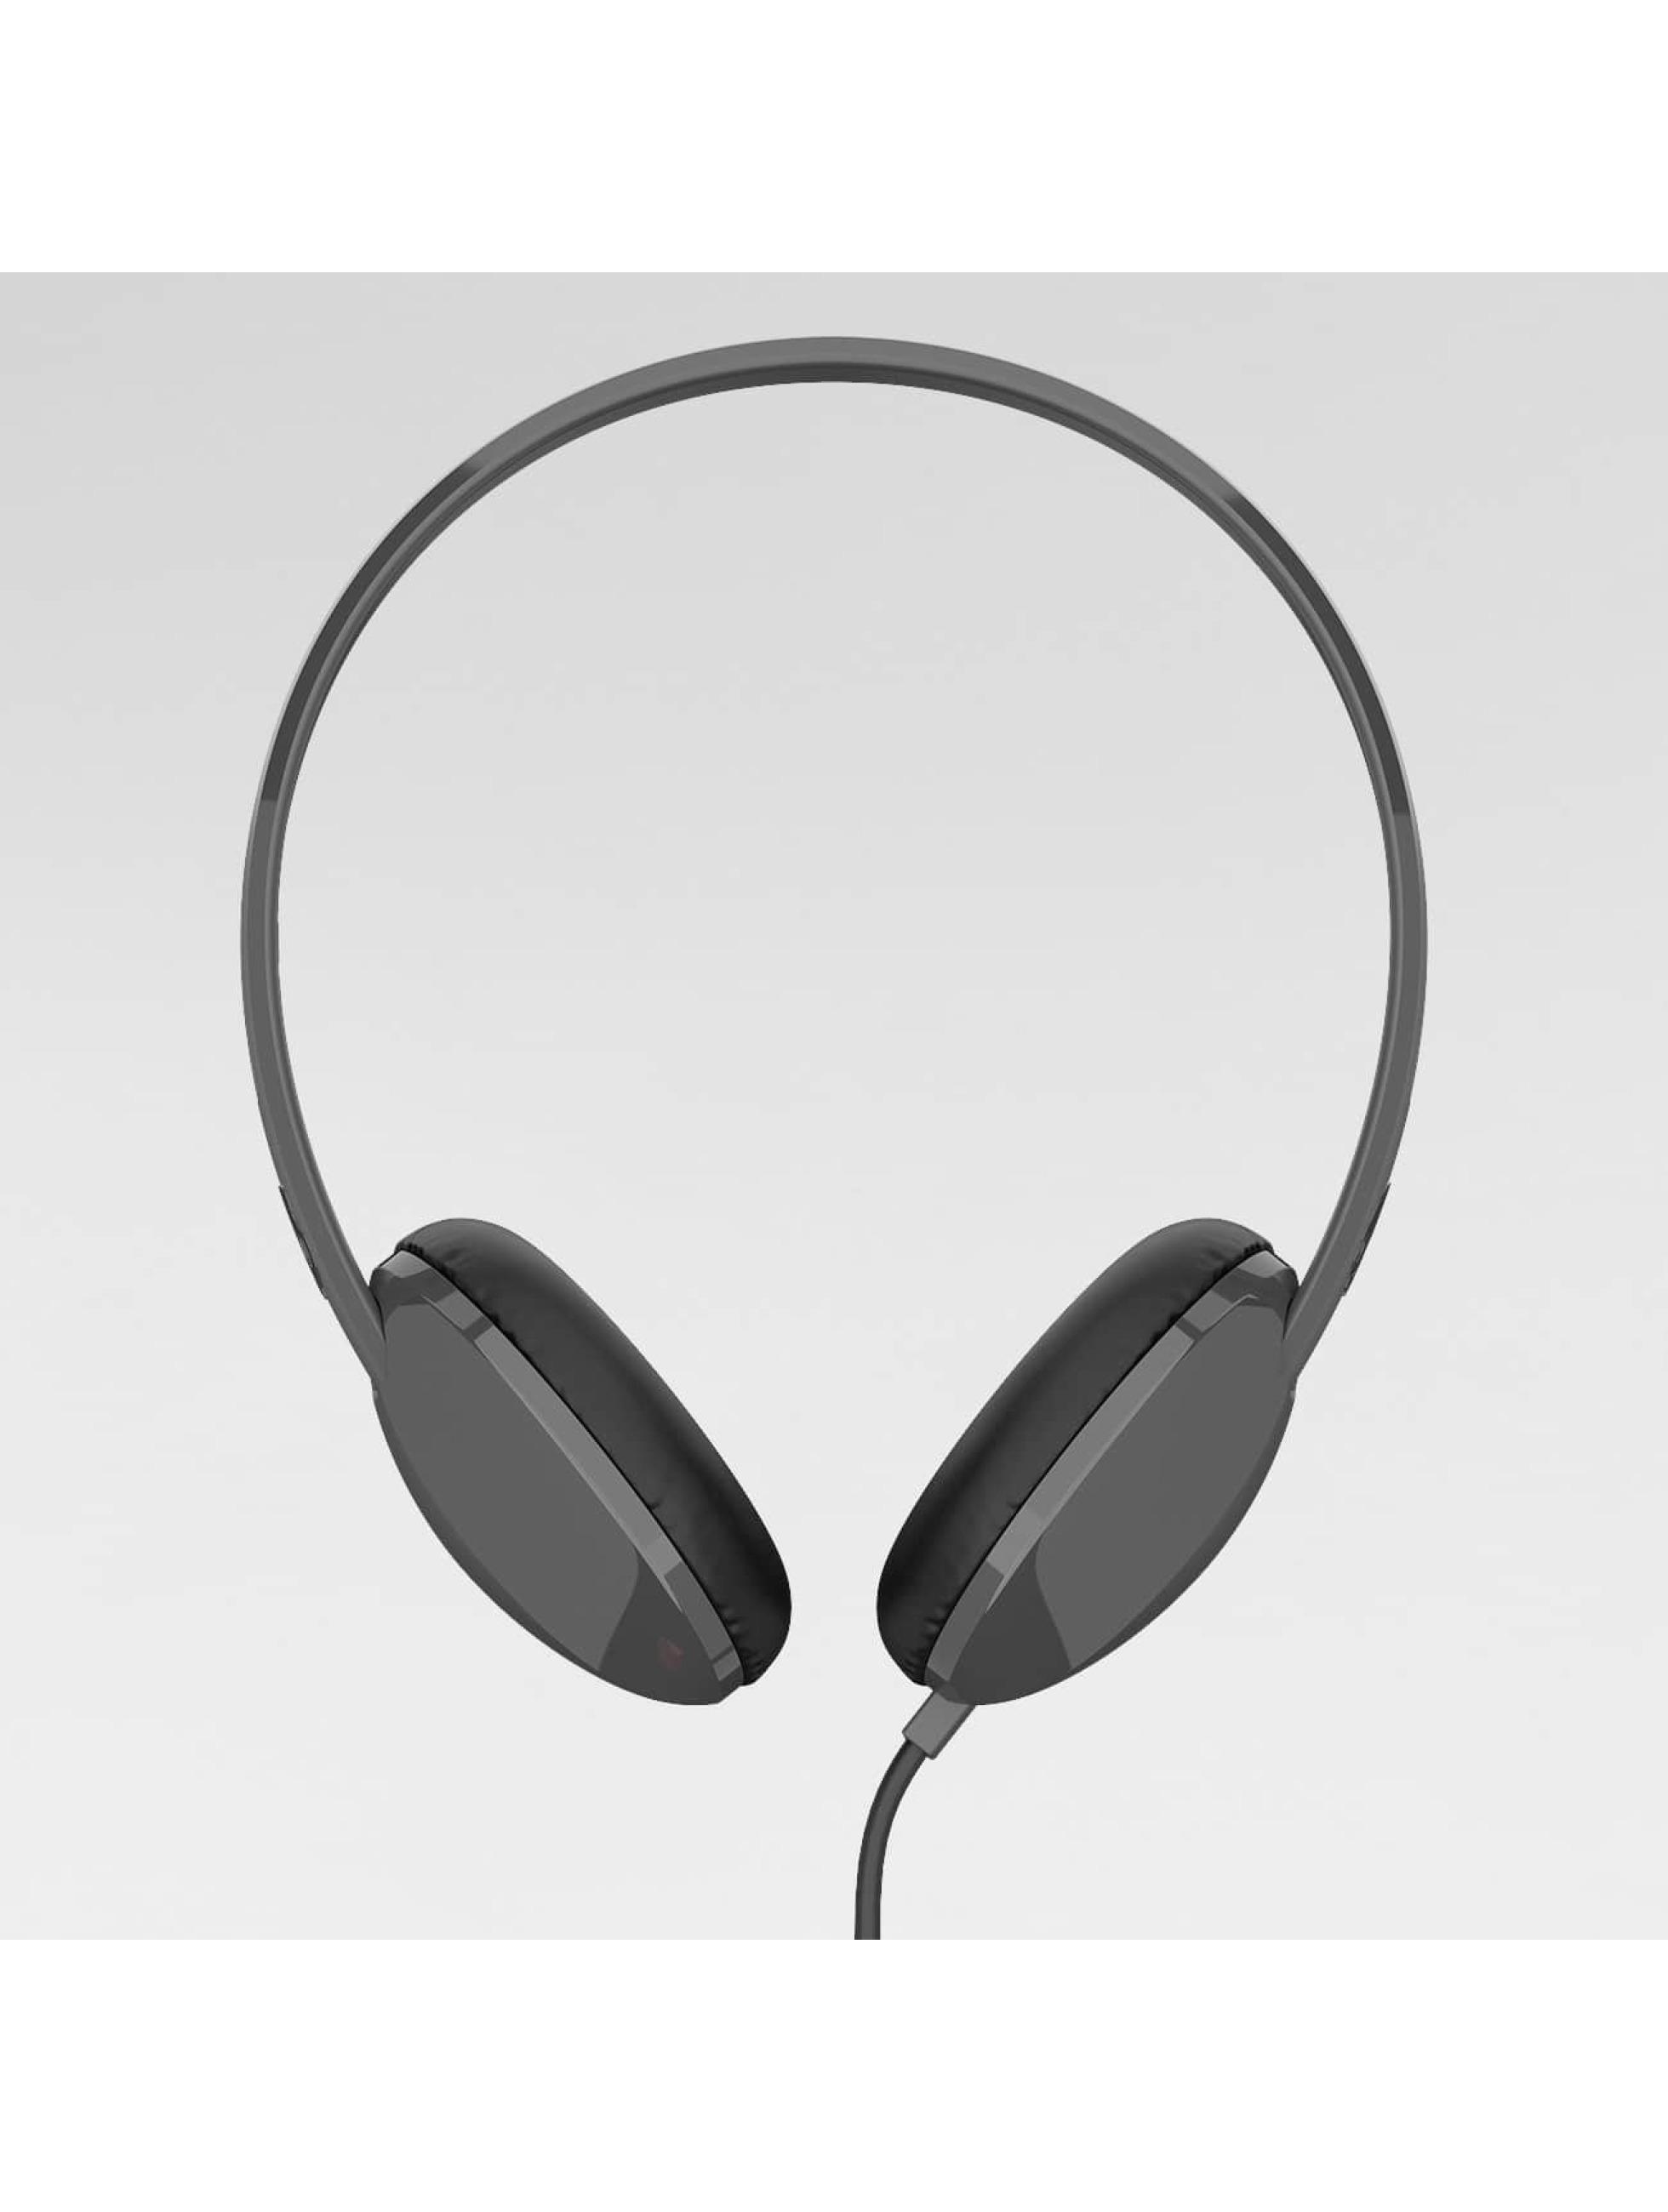 Skullcandy Auriculares Stim Mic 1 On Ear negro